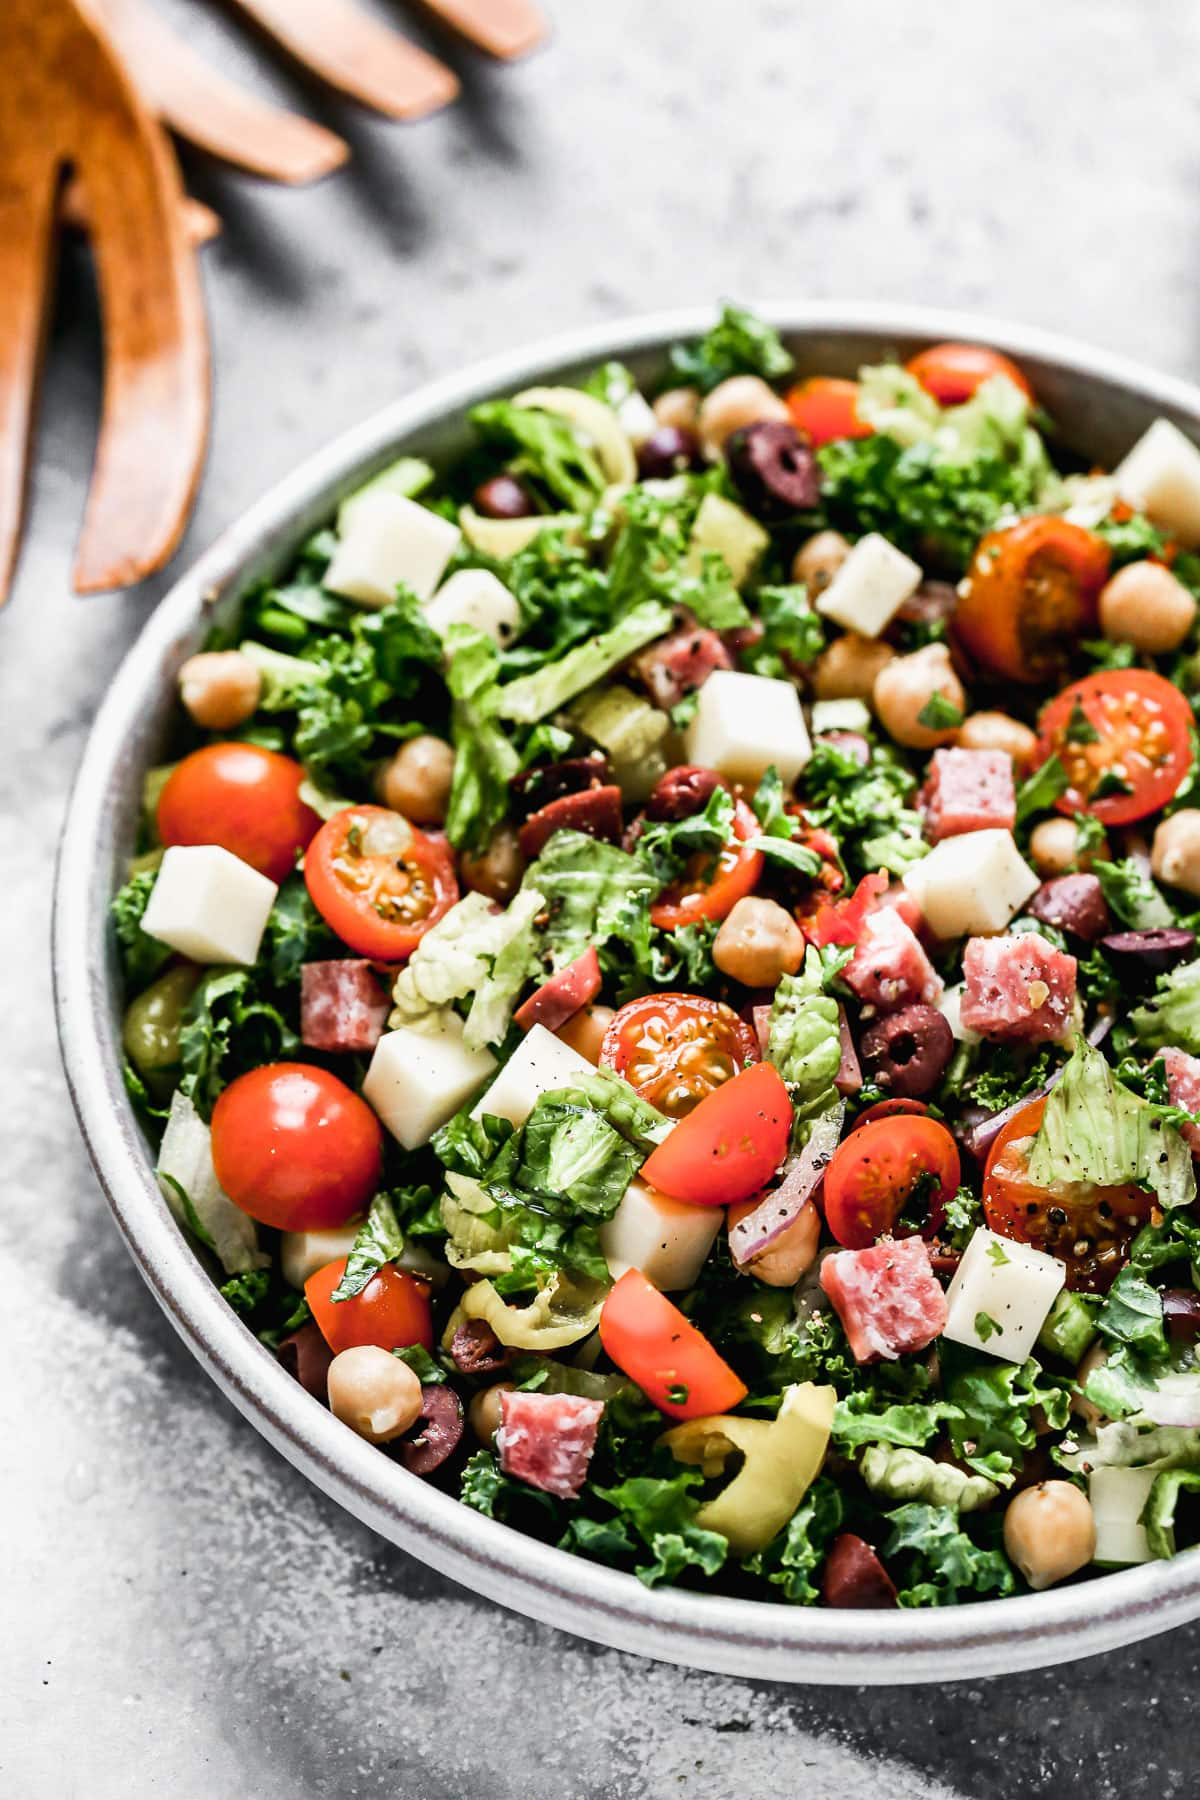 A bowl of Italian chopped salad